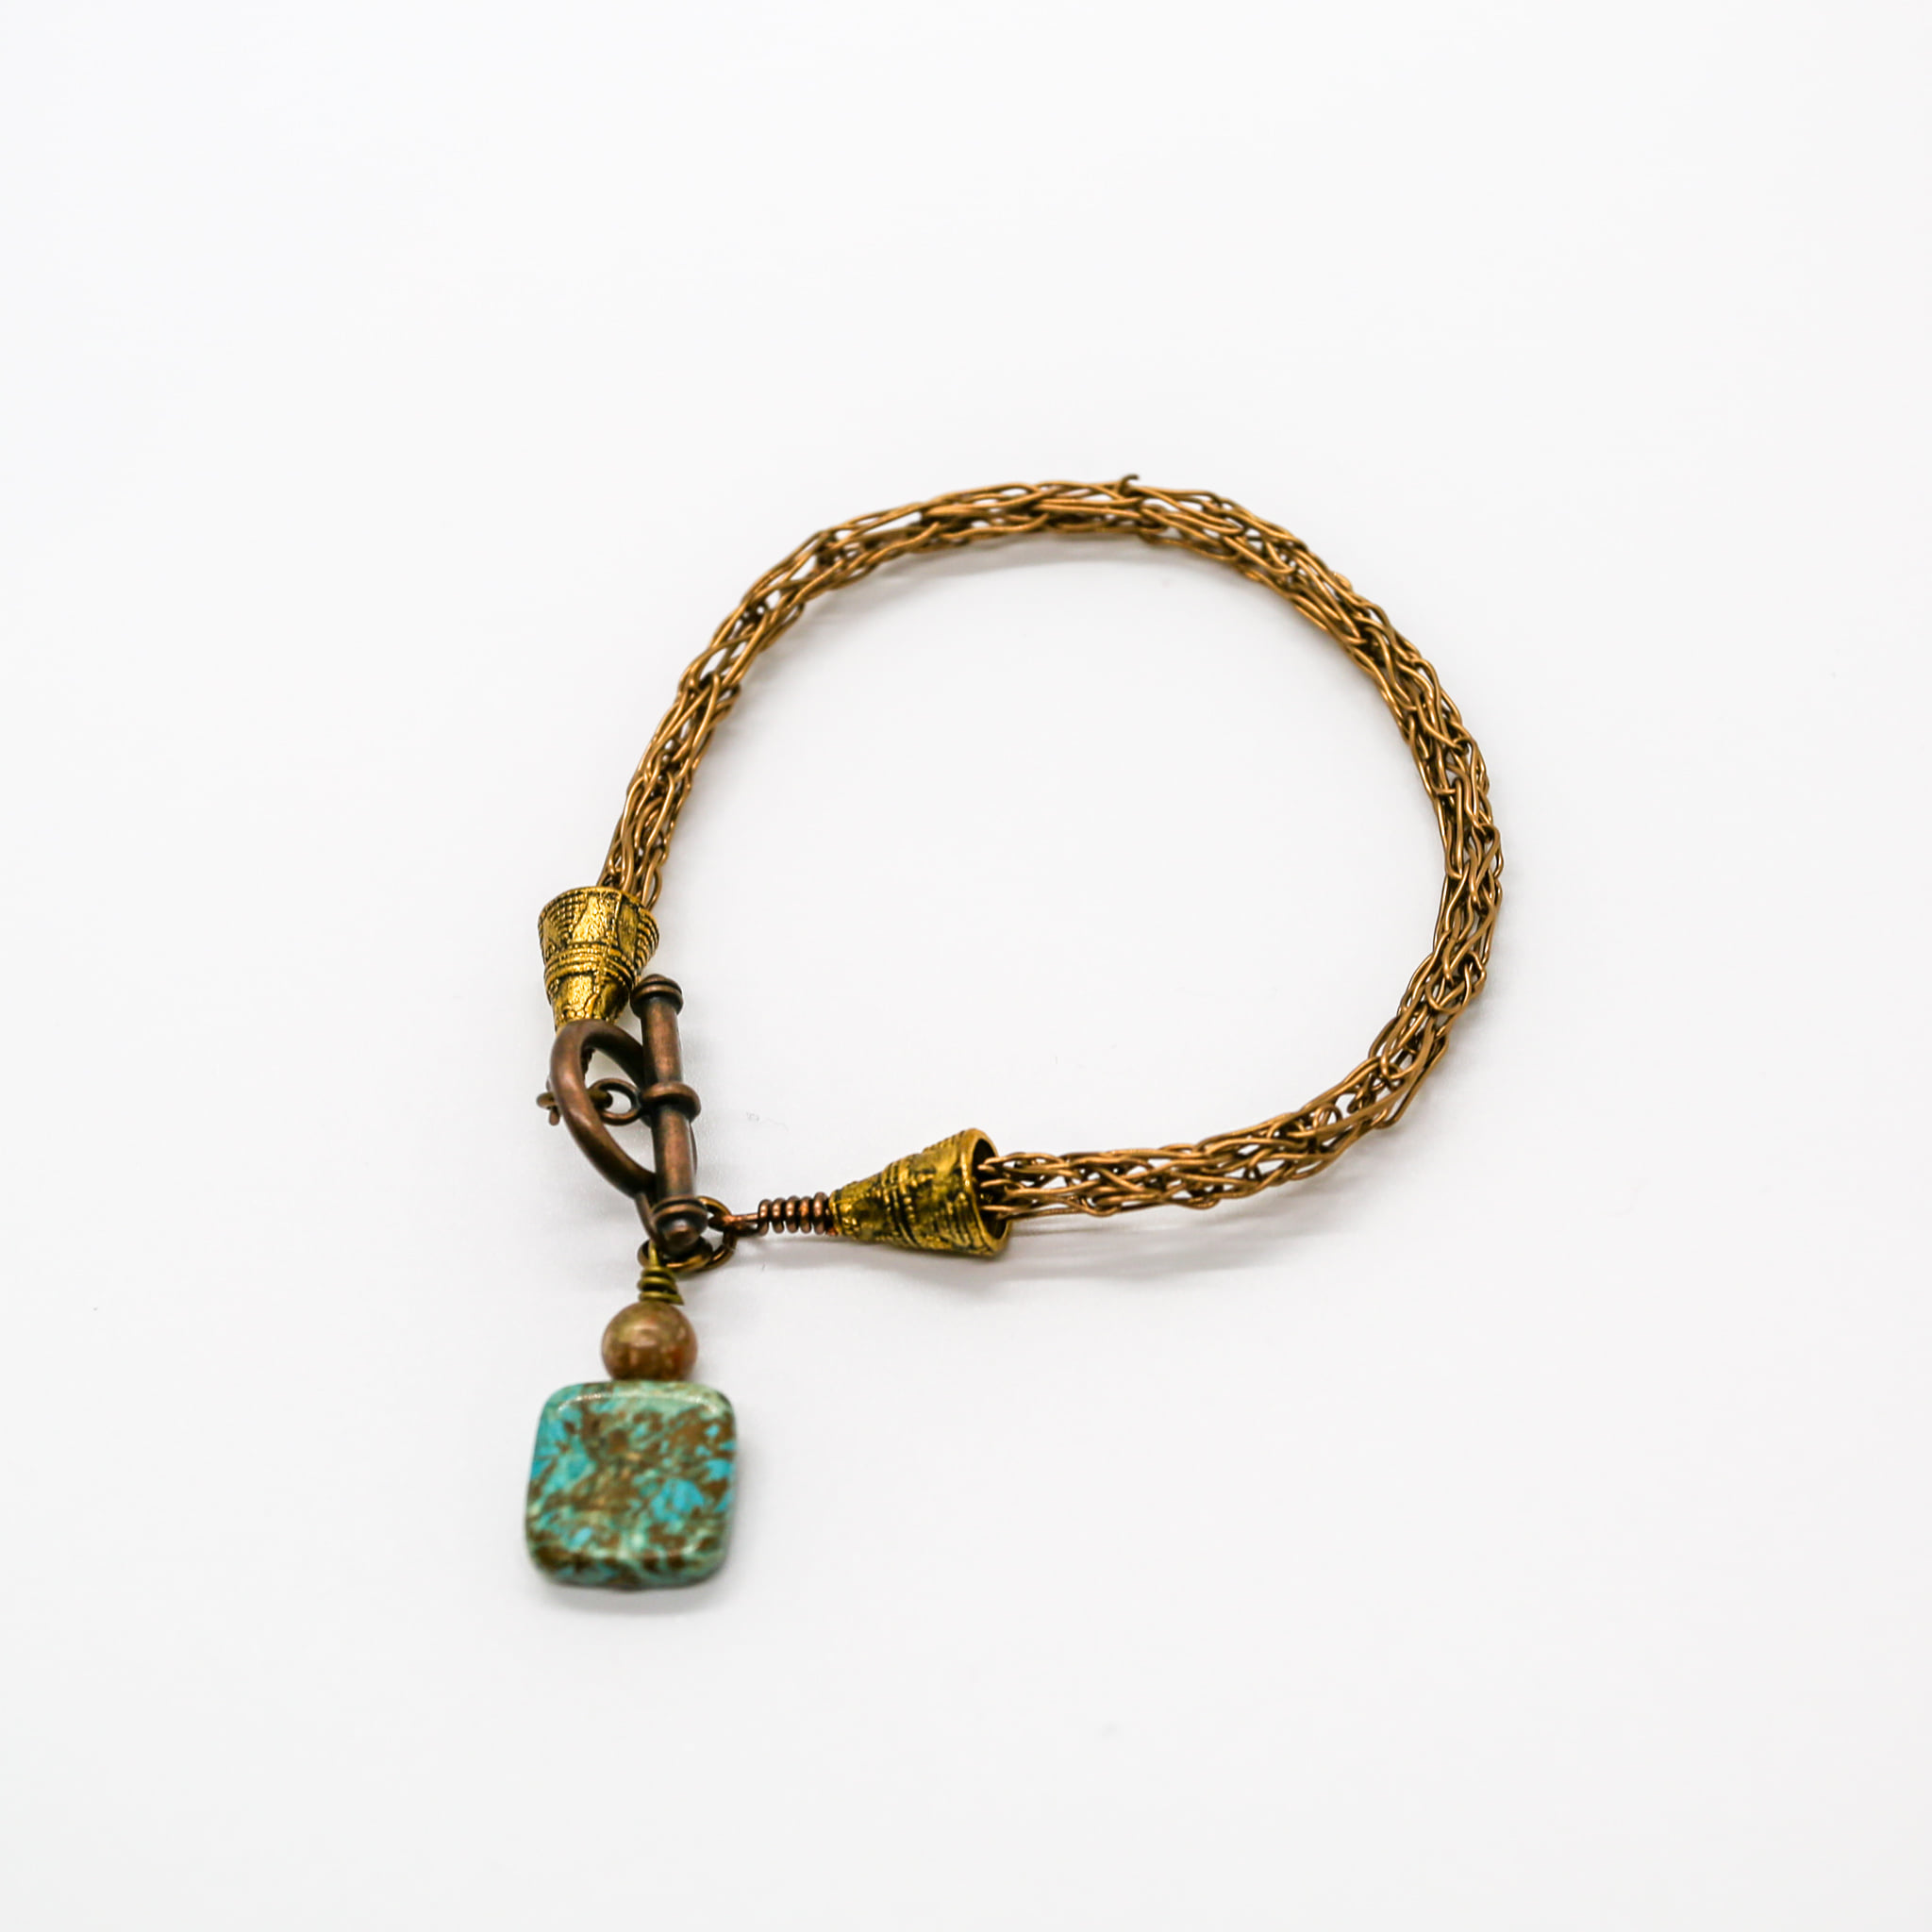 Parisian Peacock Bracelet